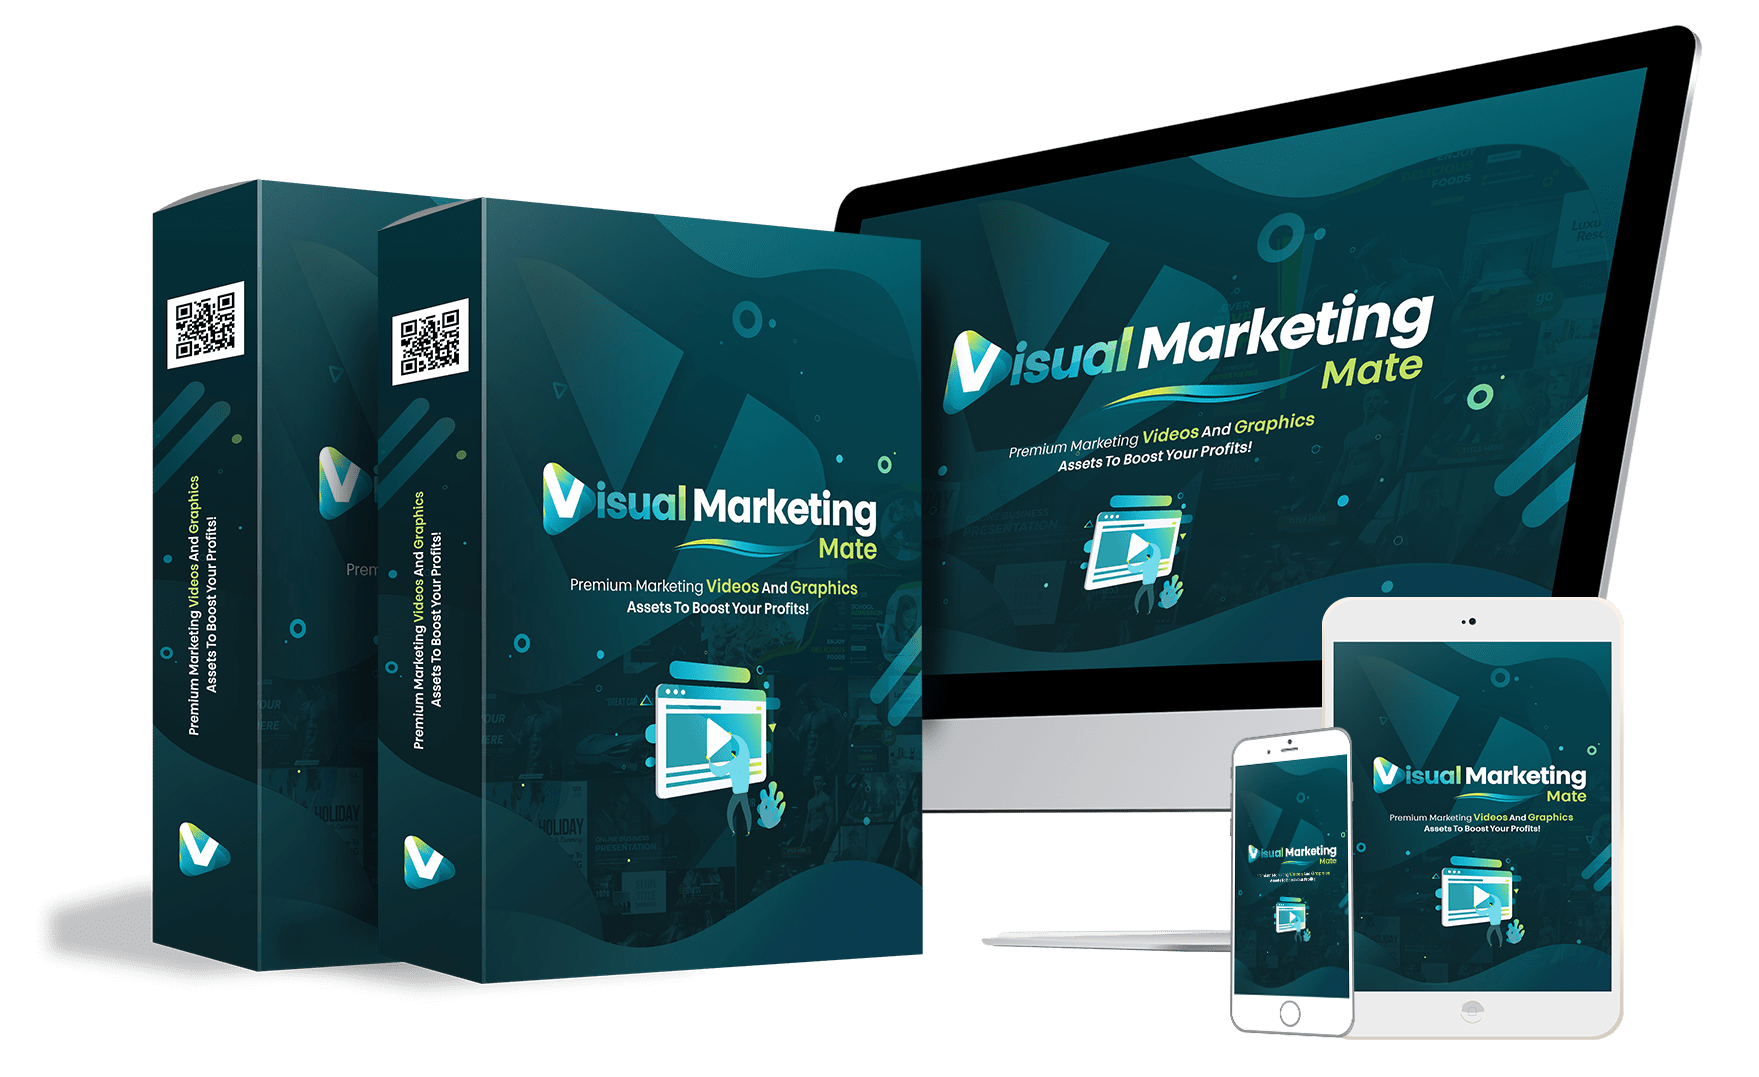 Visual Marketing Mate